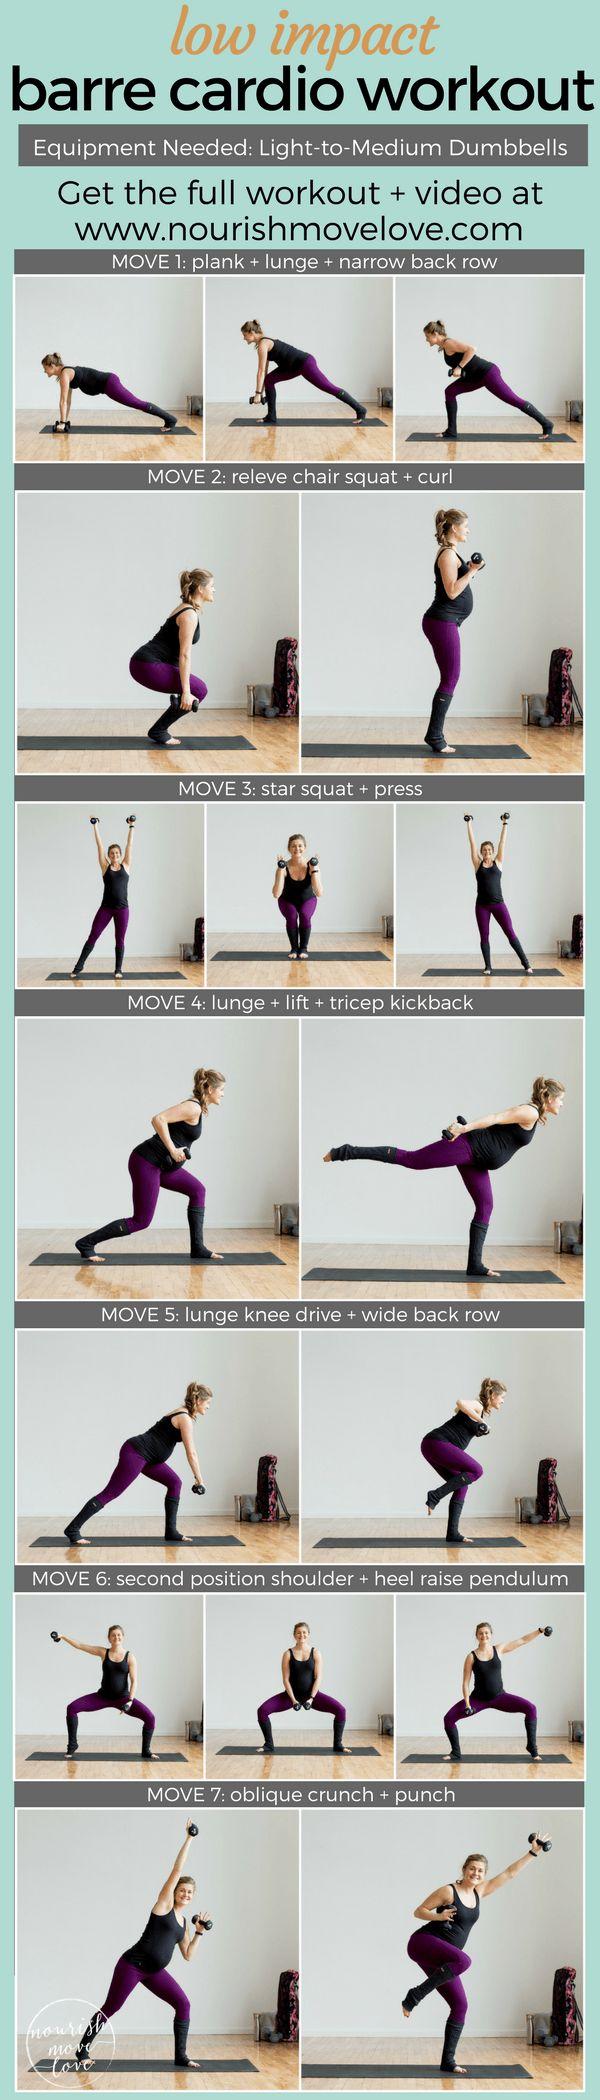 low impact barre cardio workout | www.nourishmovelove.com